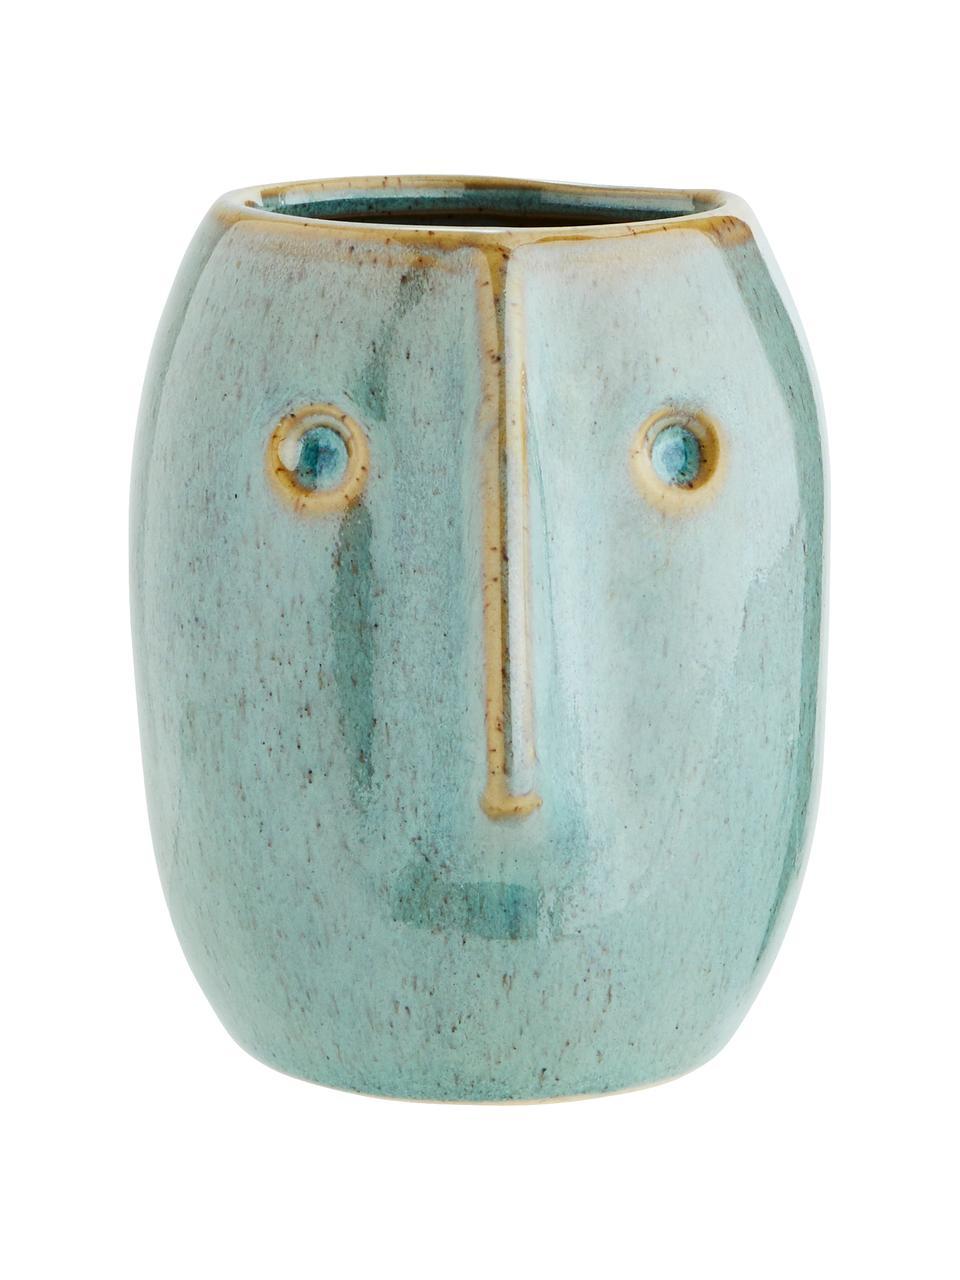 Portavaso in terracotta Face, Terracotta, Verde chiaro, beige, Ø 8 x Alt. 10 cm